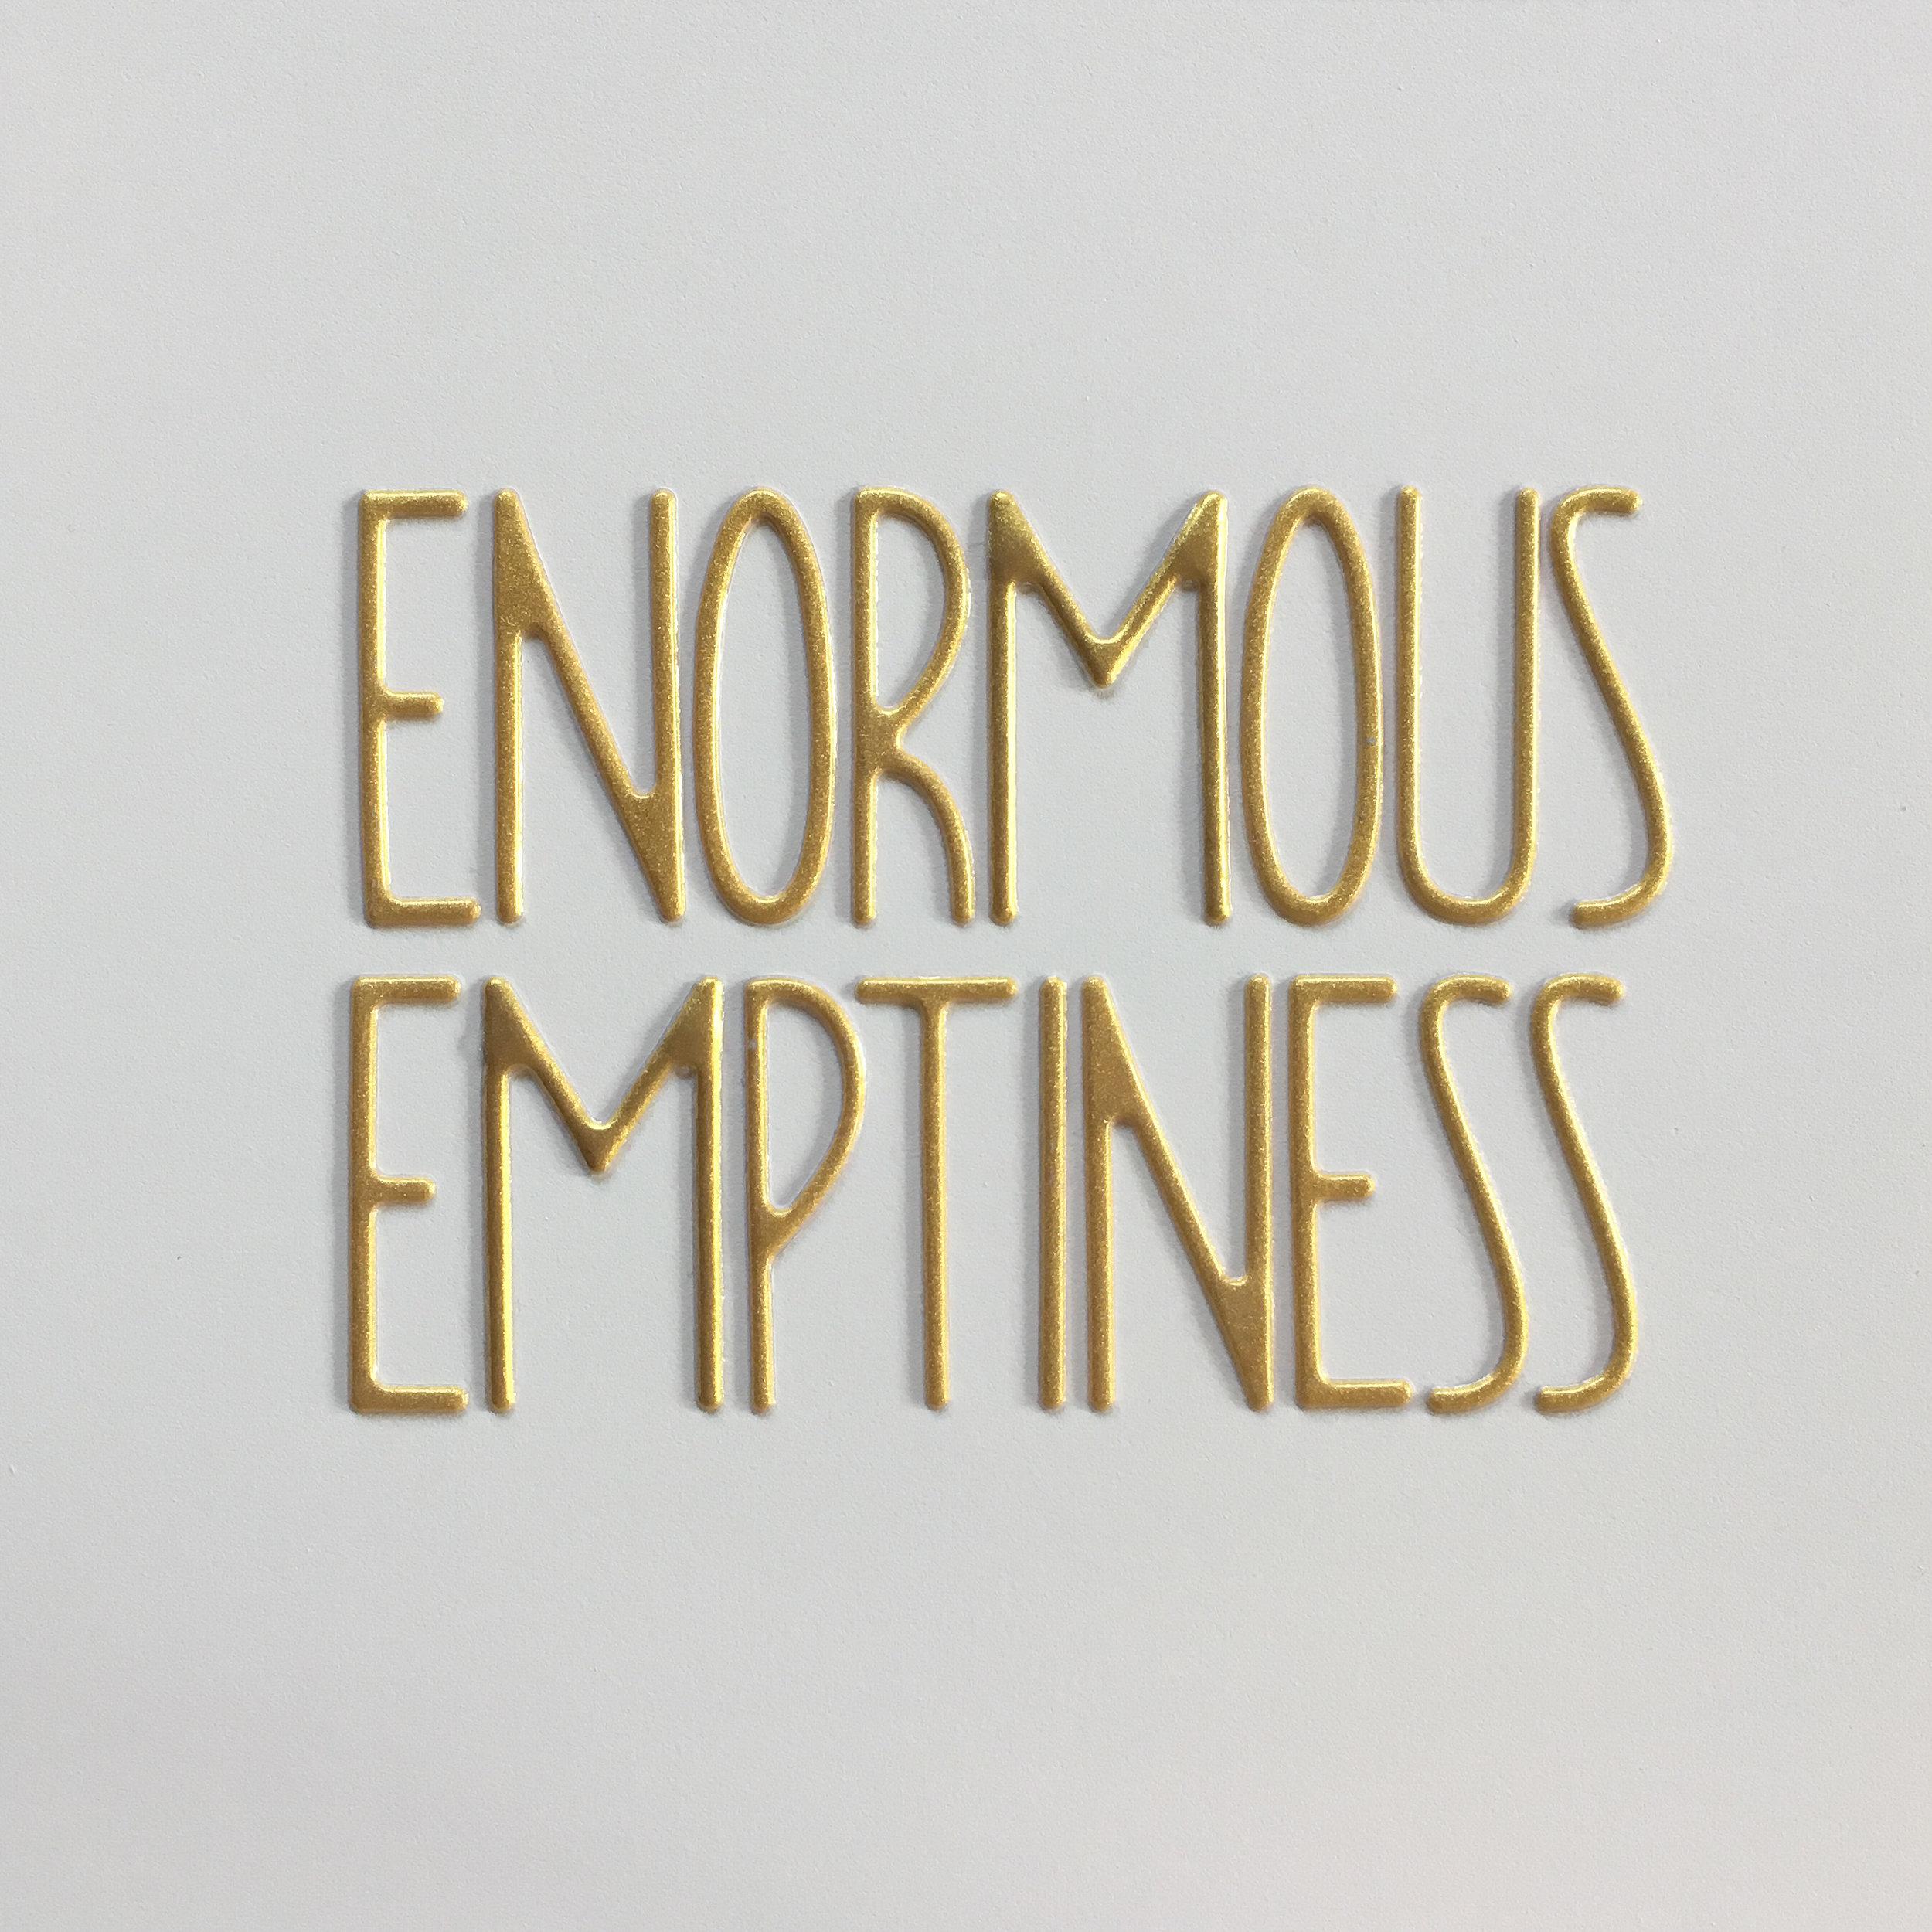 enormous emptiness.jpg